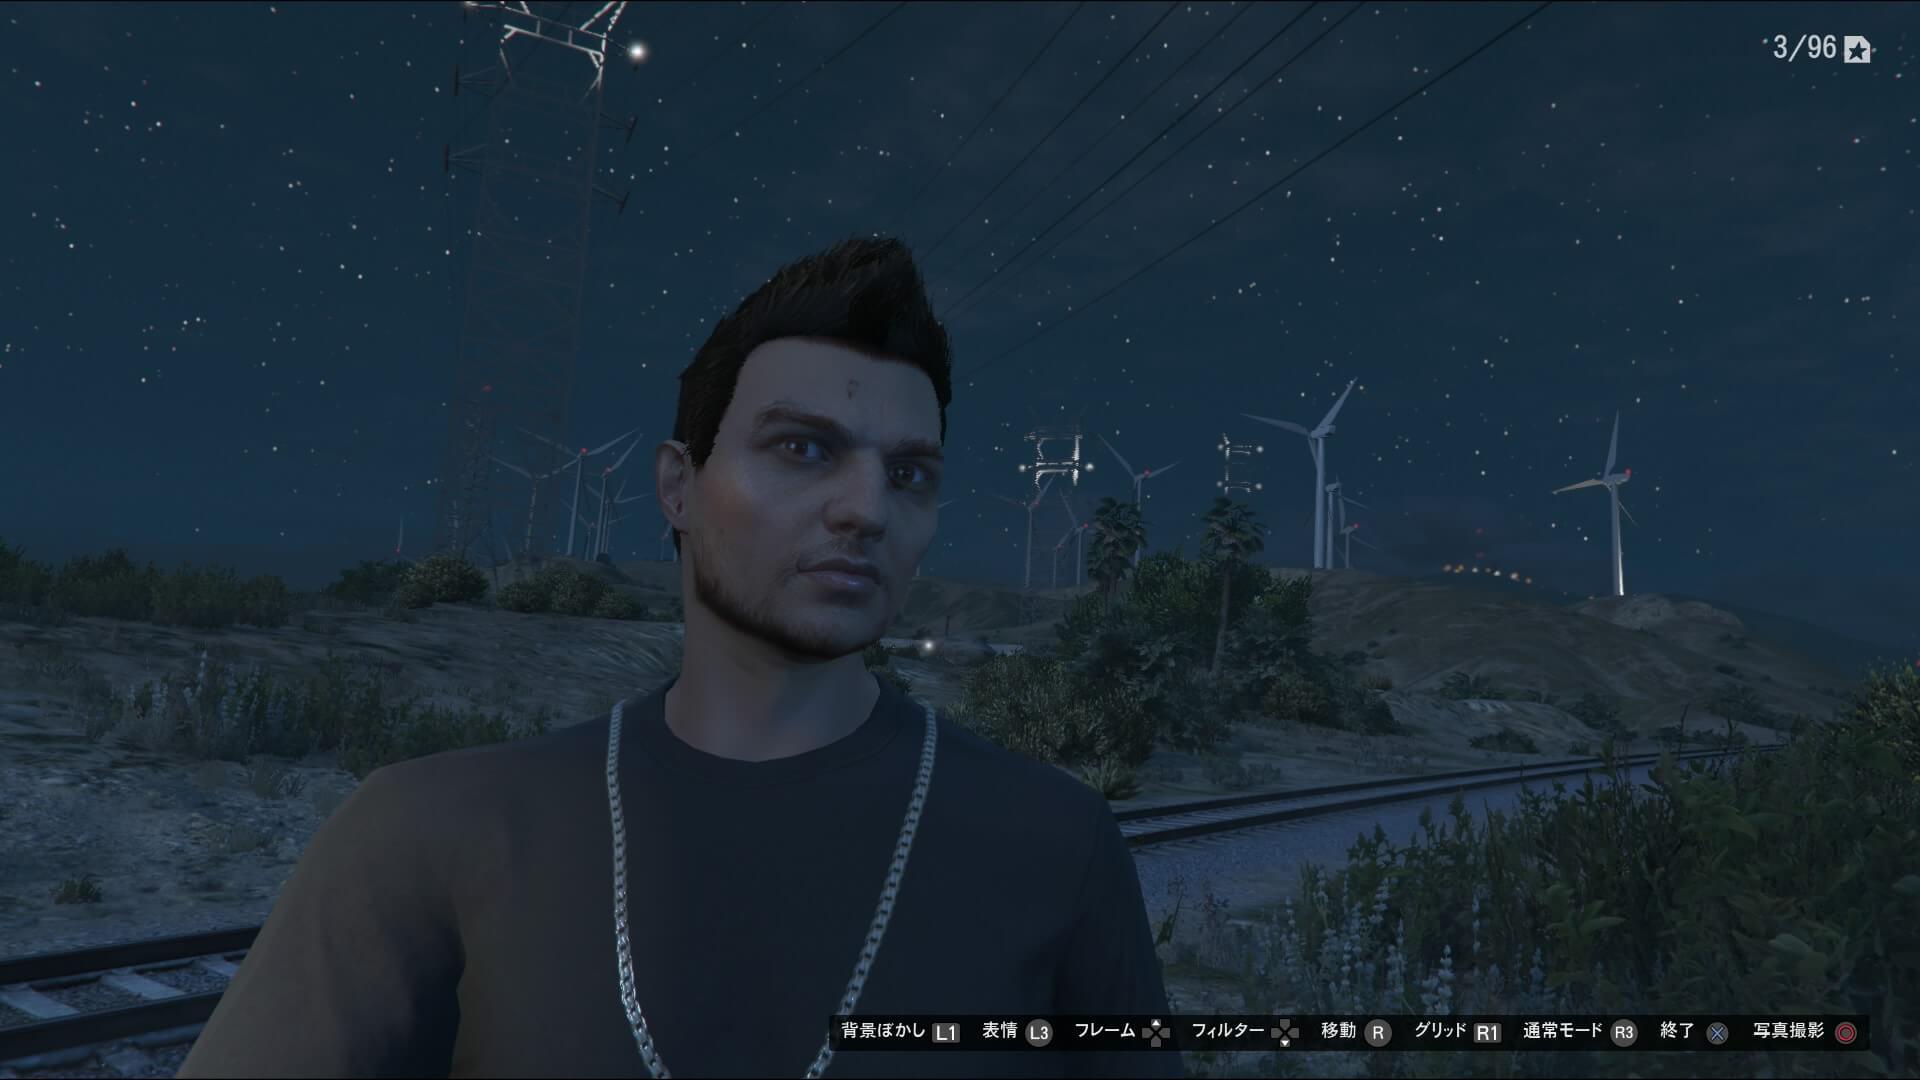 PS4版GTA5のスマホで自撮りをする方法